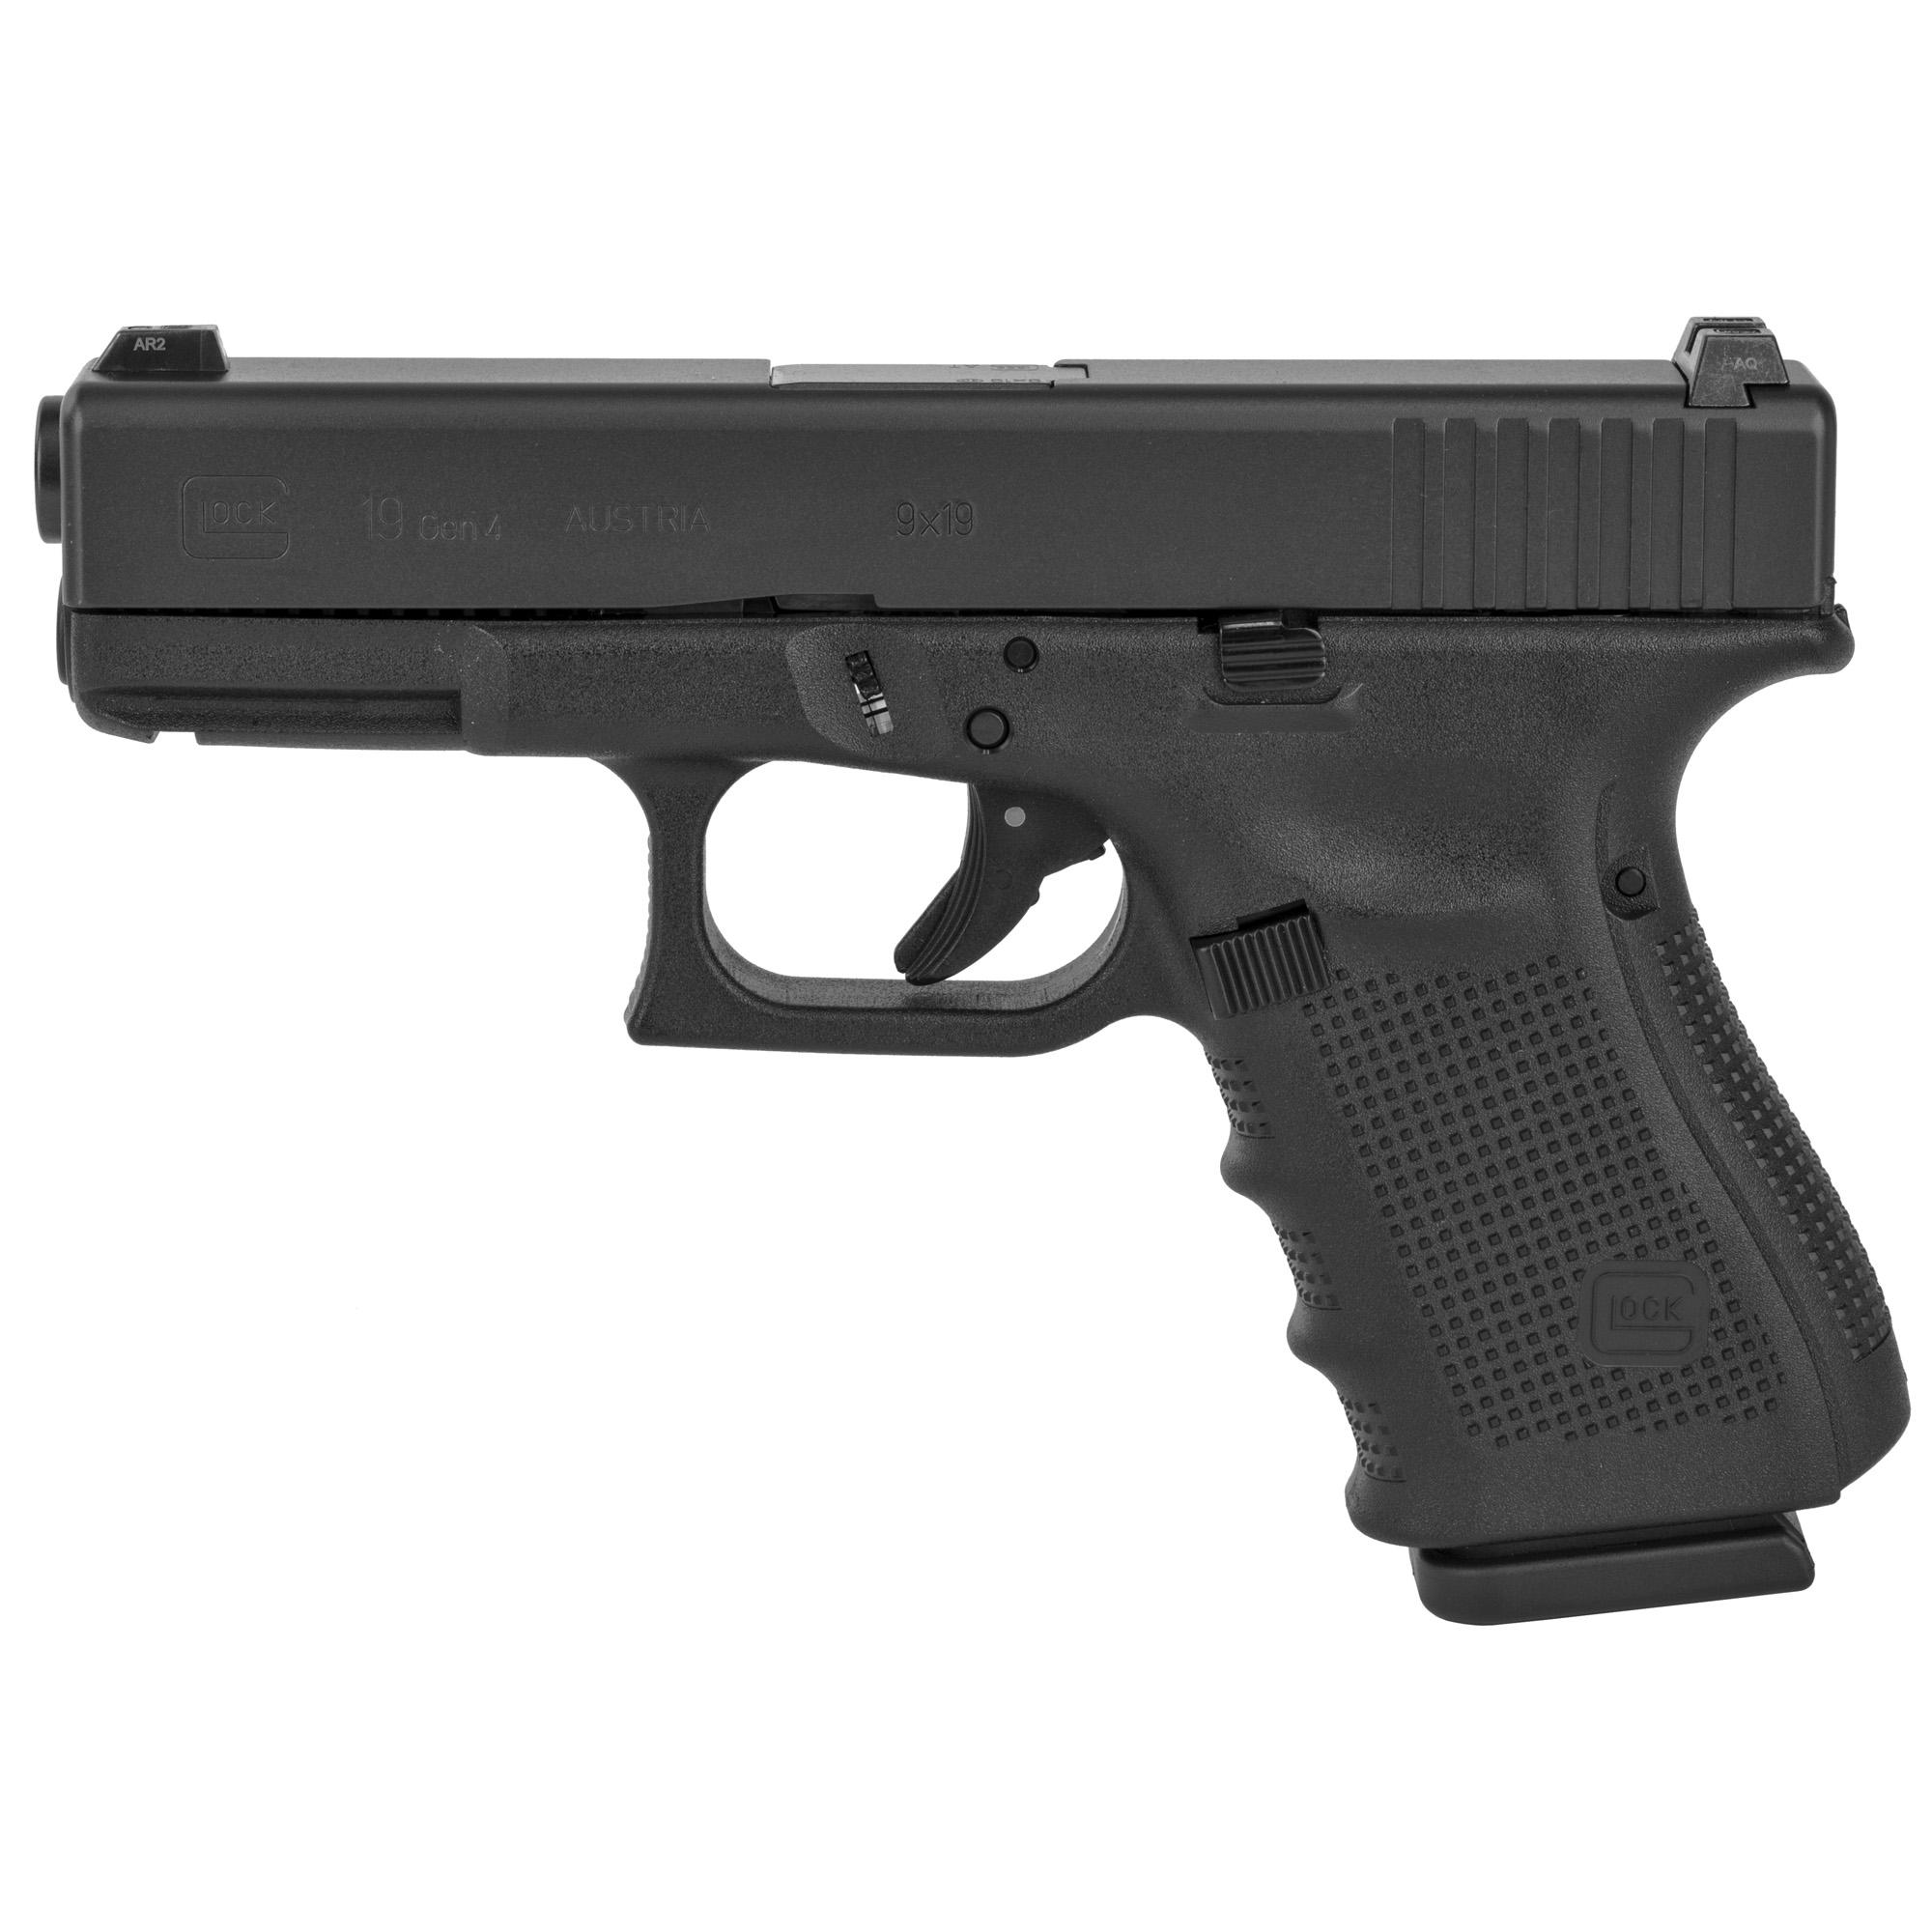 Glock 19 Gen4 9mm Gns 15rd 3 Mags